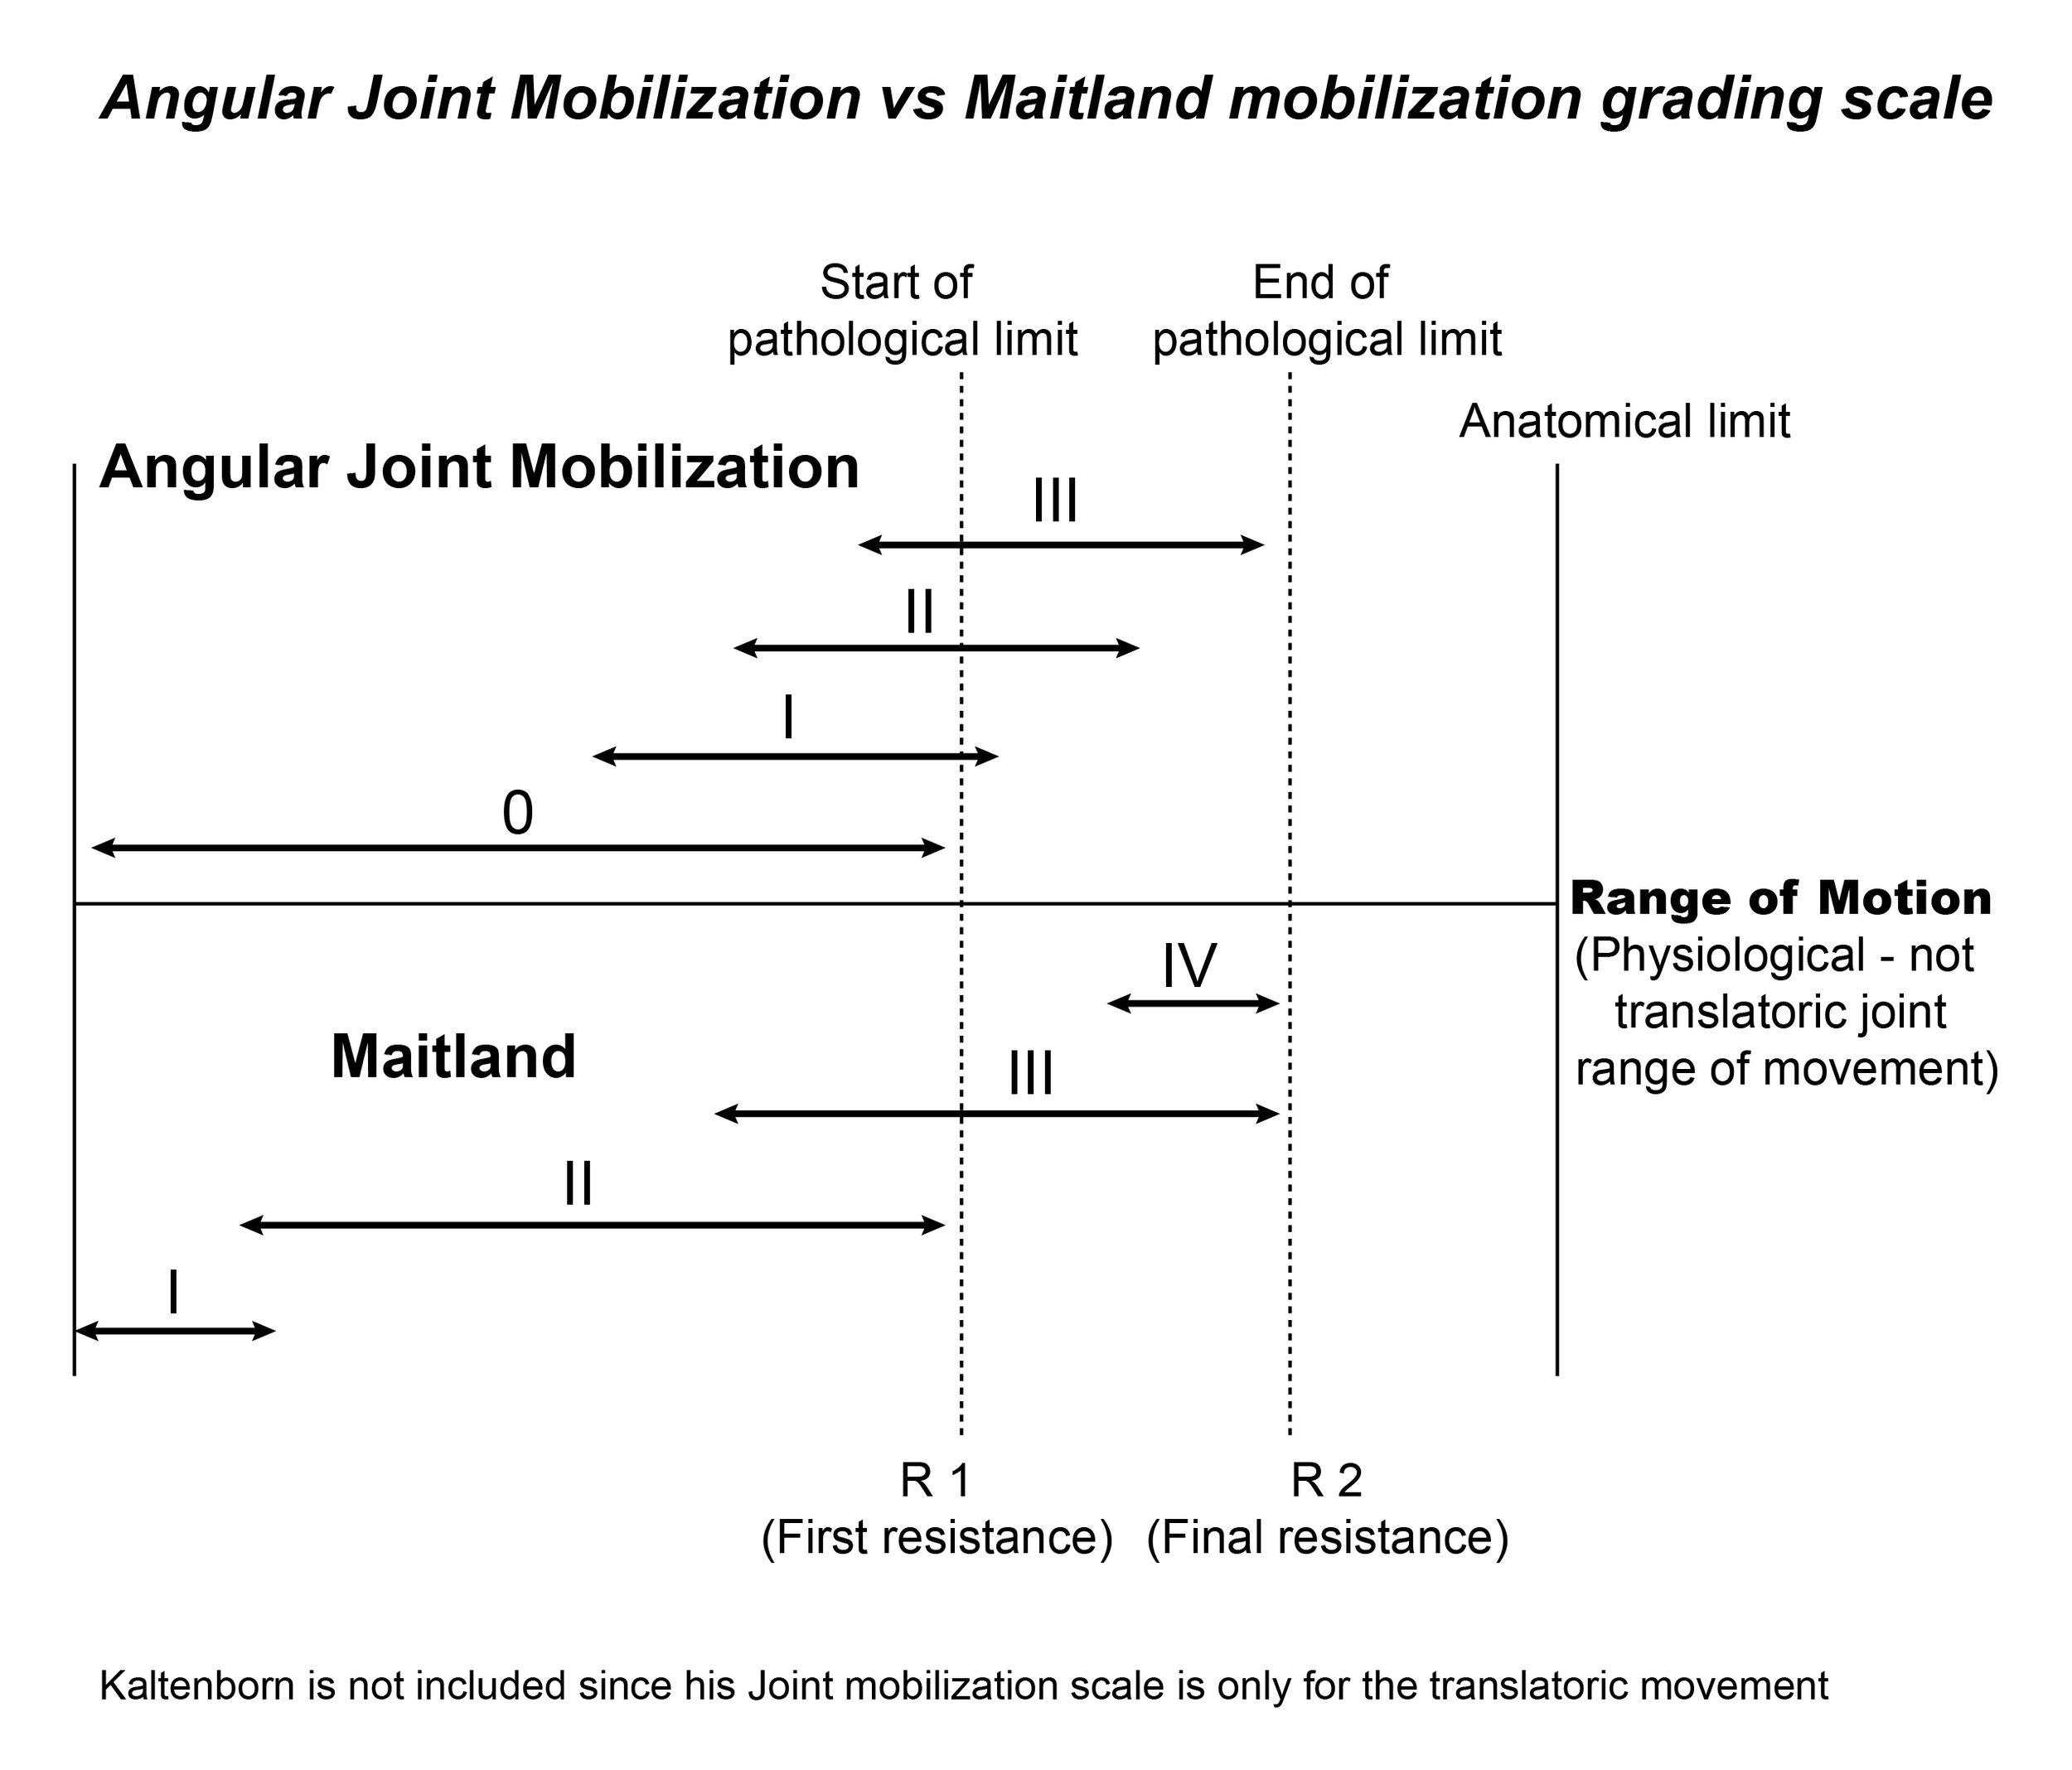 AJM vs Maitland grading scale1.jpg